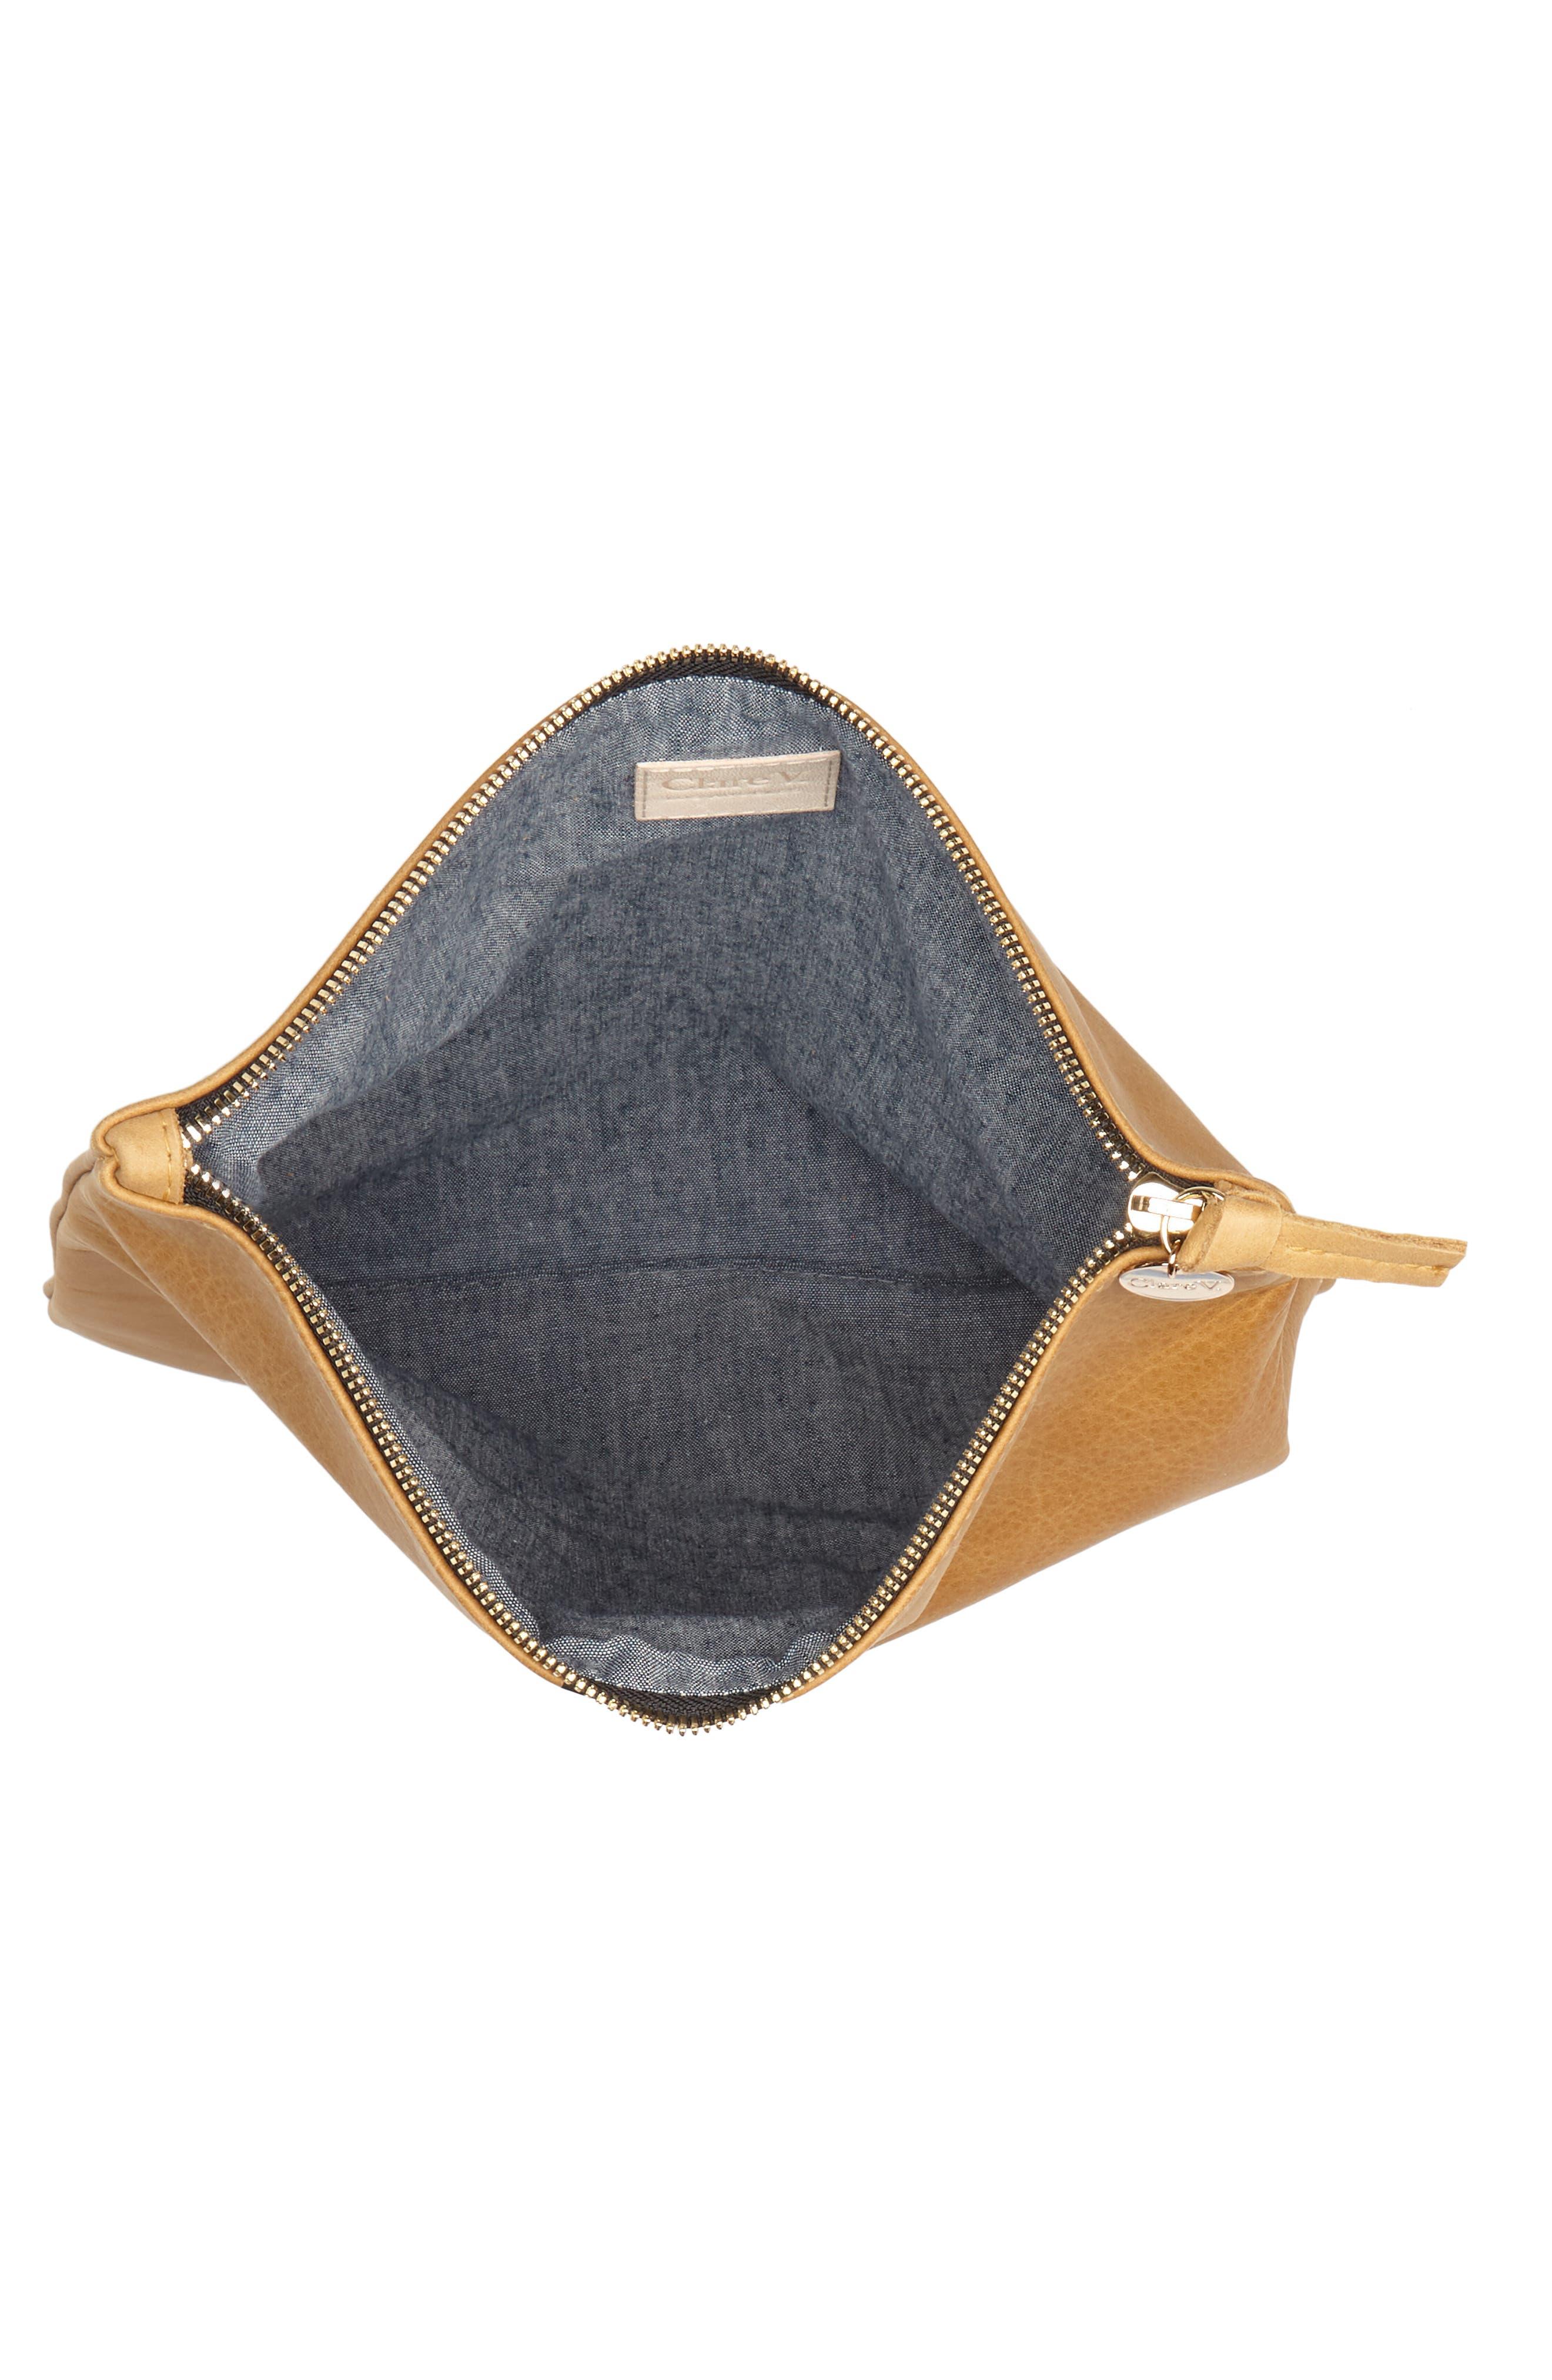 Center Stripe Leather Foldover Clutch,                             Alternate thumbnail 4, color,                             Nubuck Blck Whte Stripe